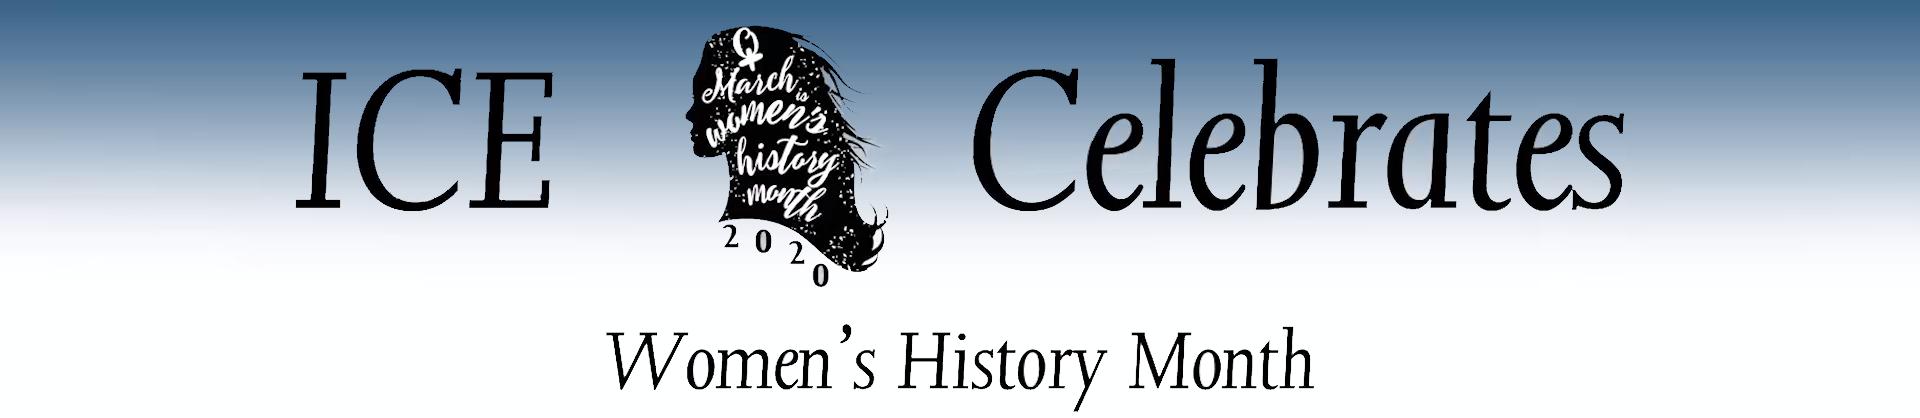 ICE celebrates Women's History Month